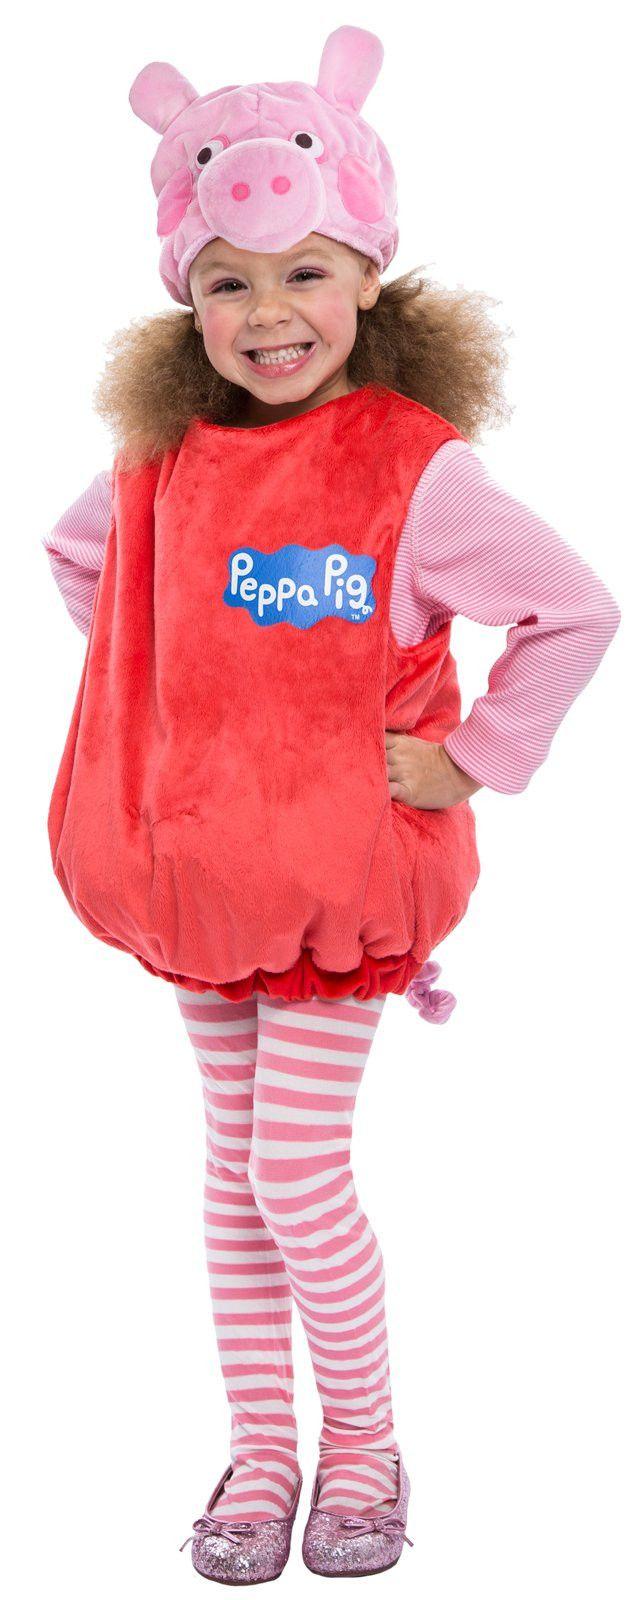 best Halloween costume ideas images on Pinterest  Costumes